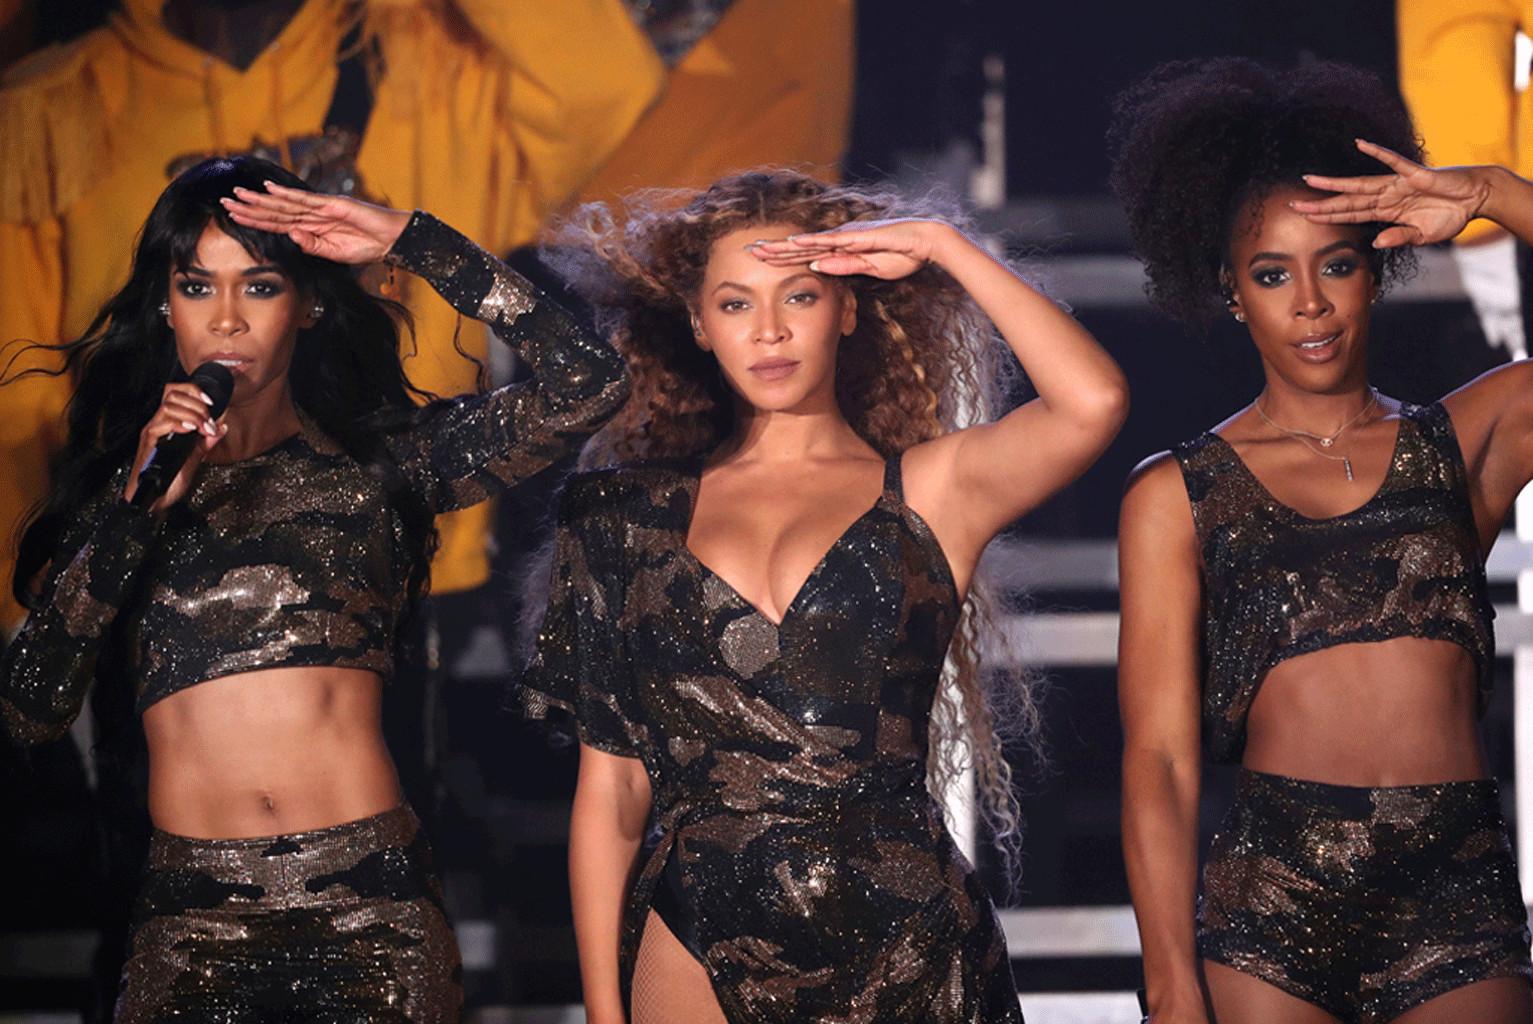 Kelly Rowland Destinys Child Beyoncé Has a Des...